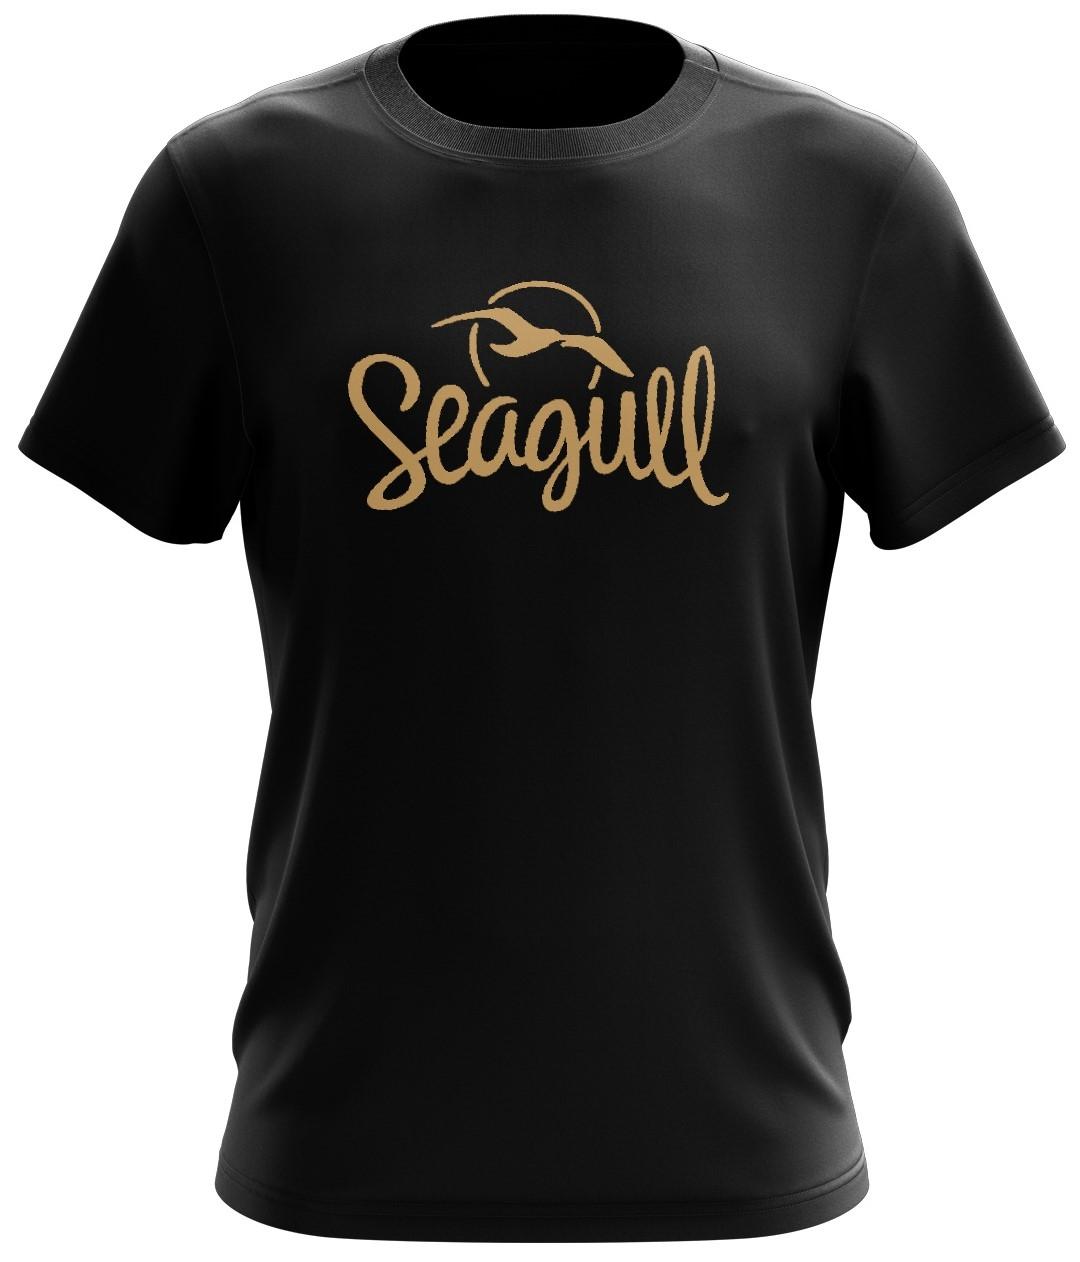 SEAGULL Logo T-Shirt Black L